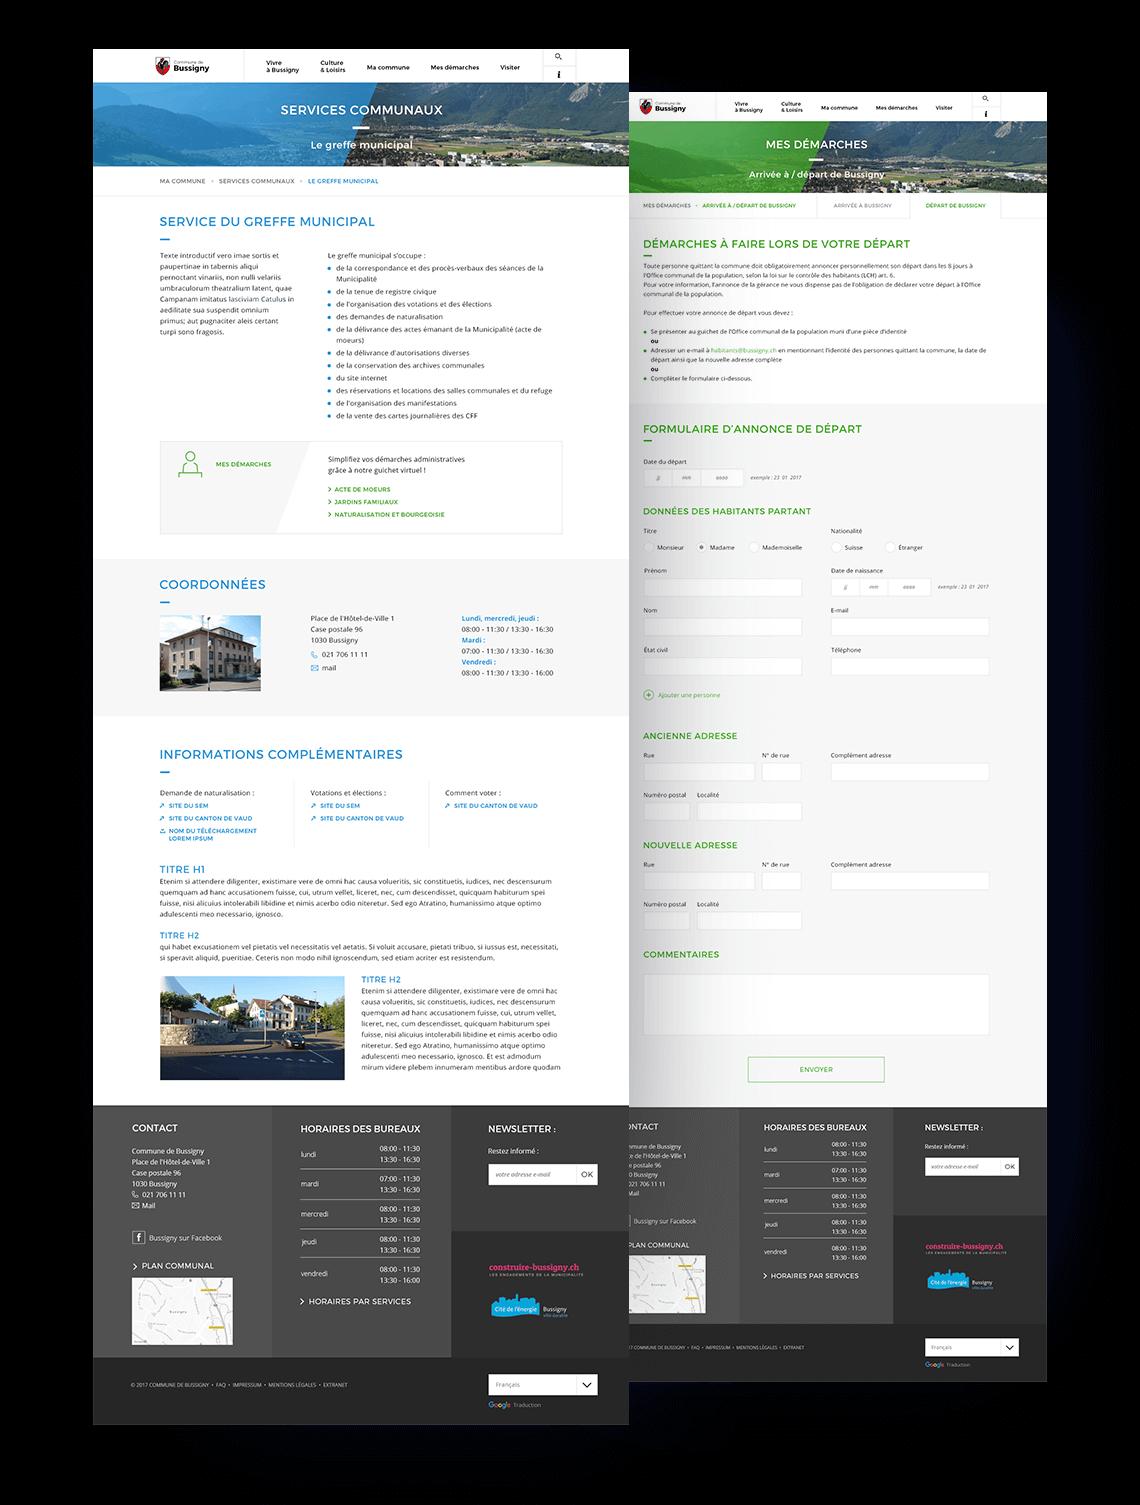 projet bussigny site web 2